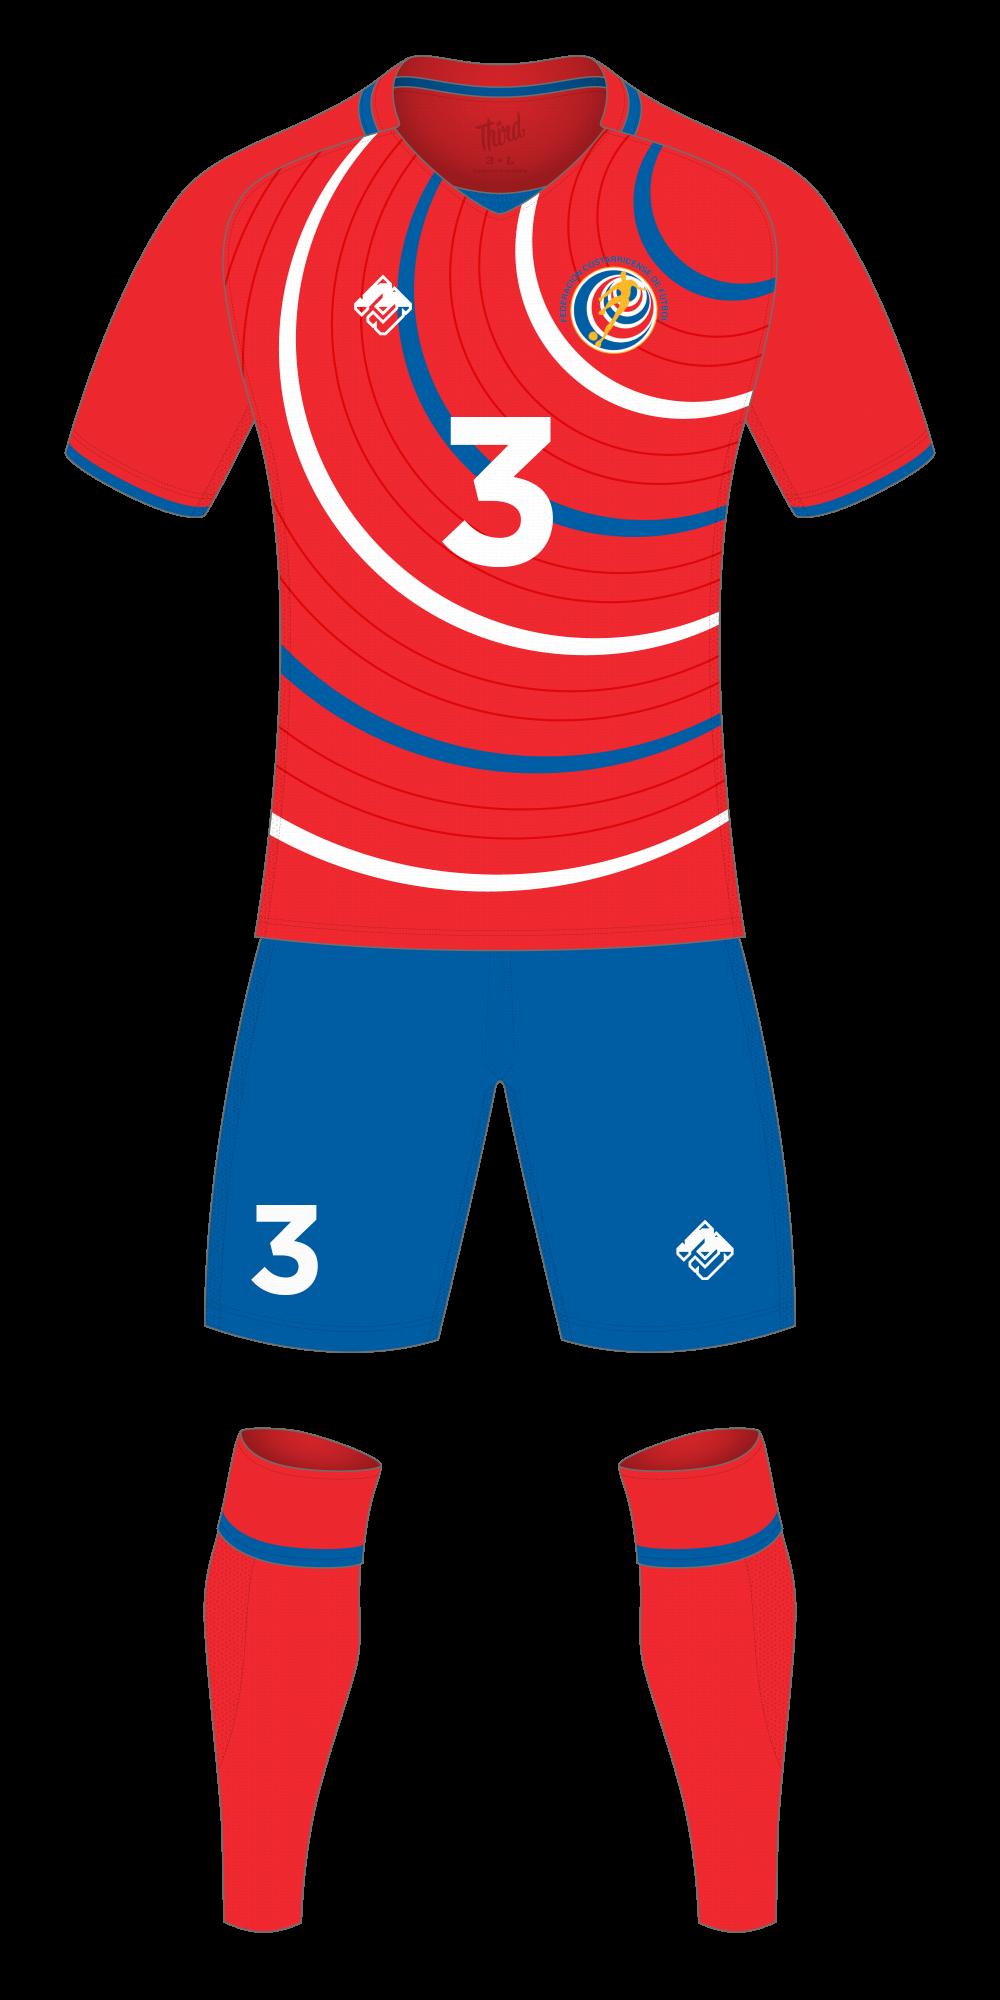 Costa Rica World Cup 2018 concept